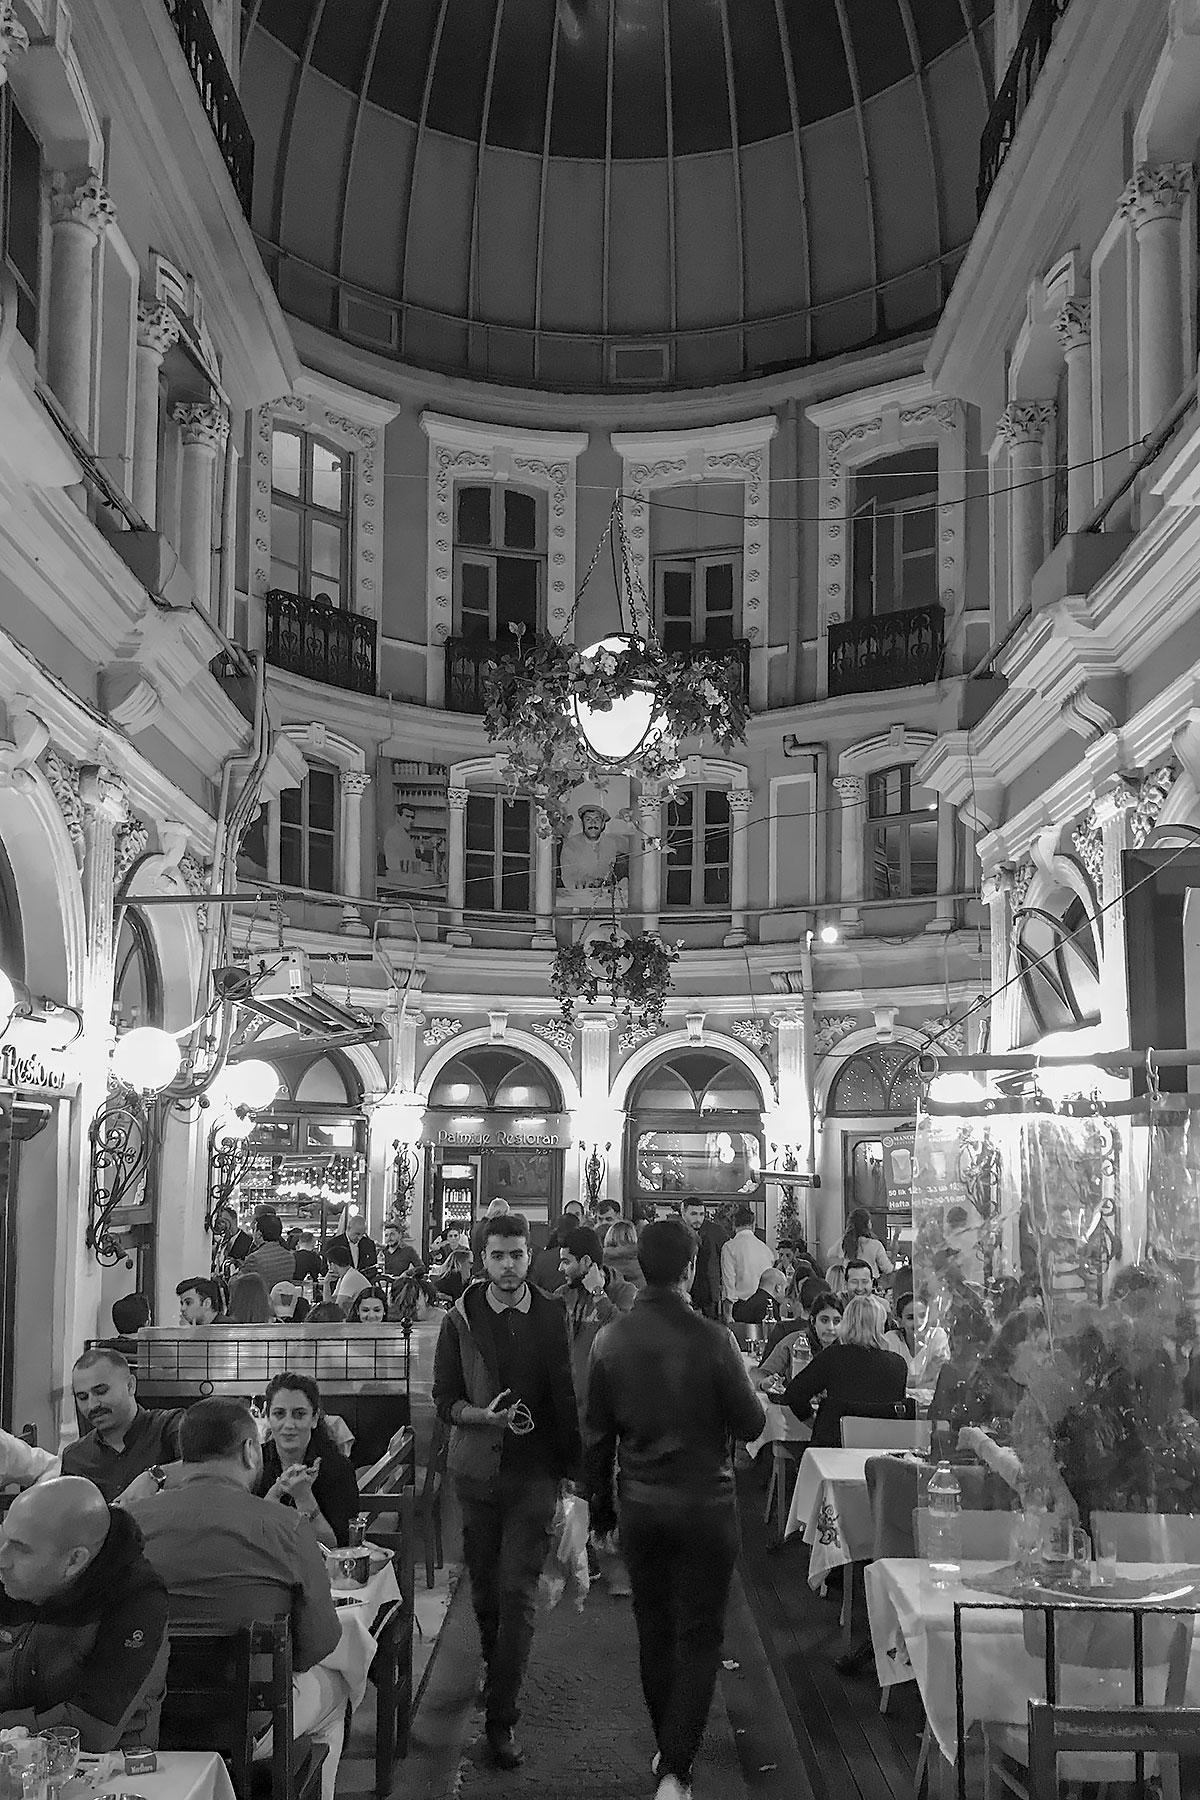 Istanbul-night-life-meyhana.jpg